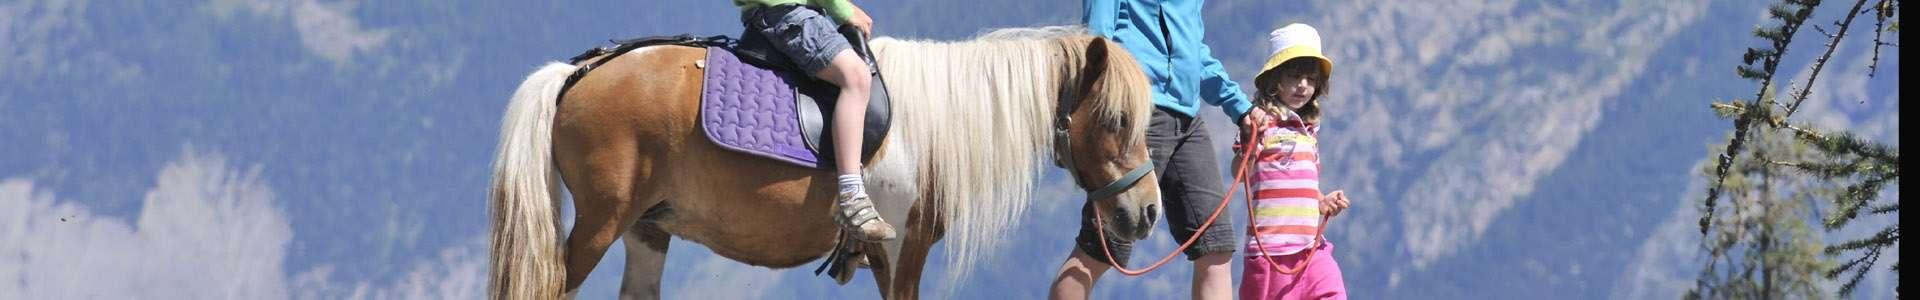 equitation-362